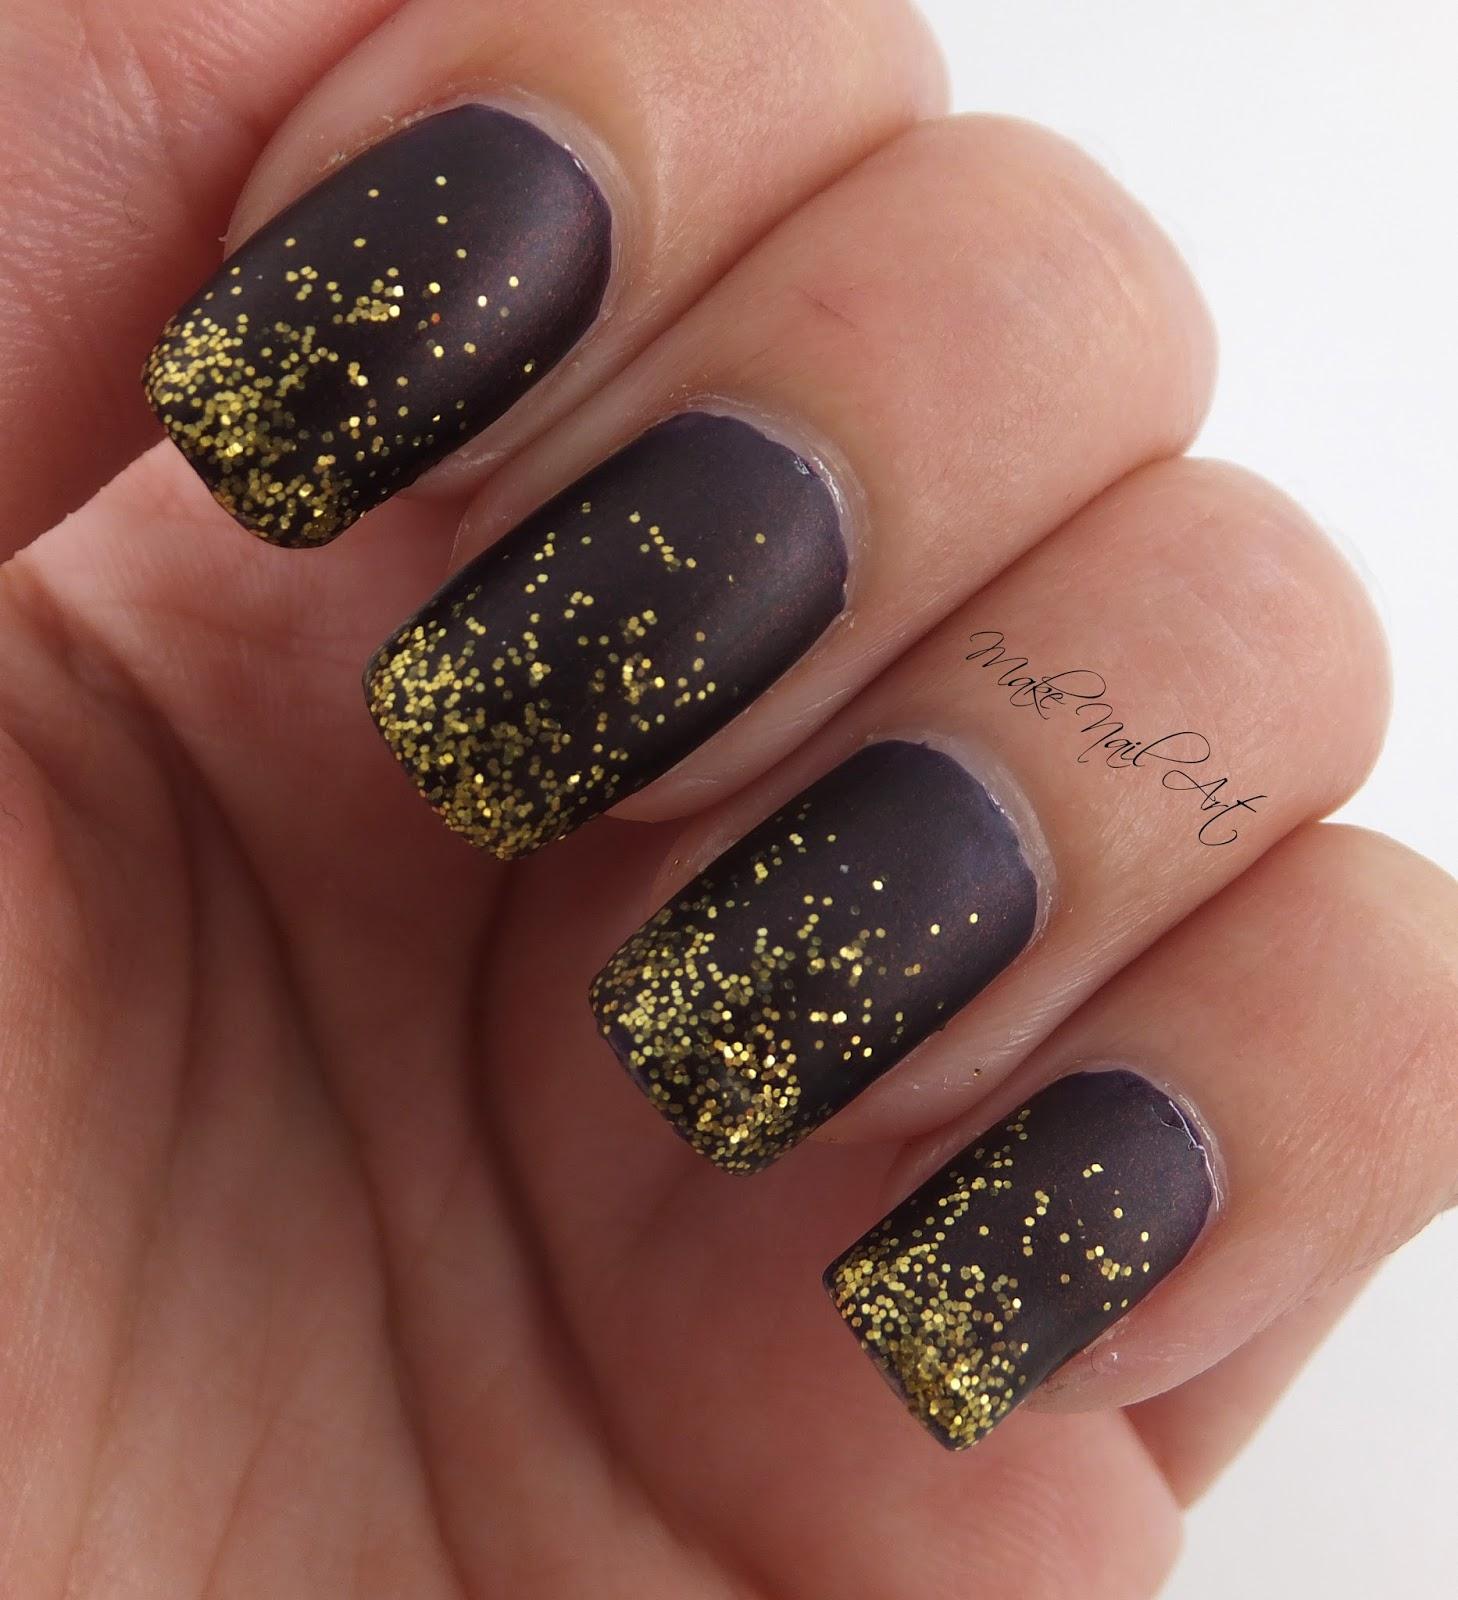 Make Nail Art: Easy Autumn Red And Gold Glitter Nails Nail Art ...